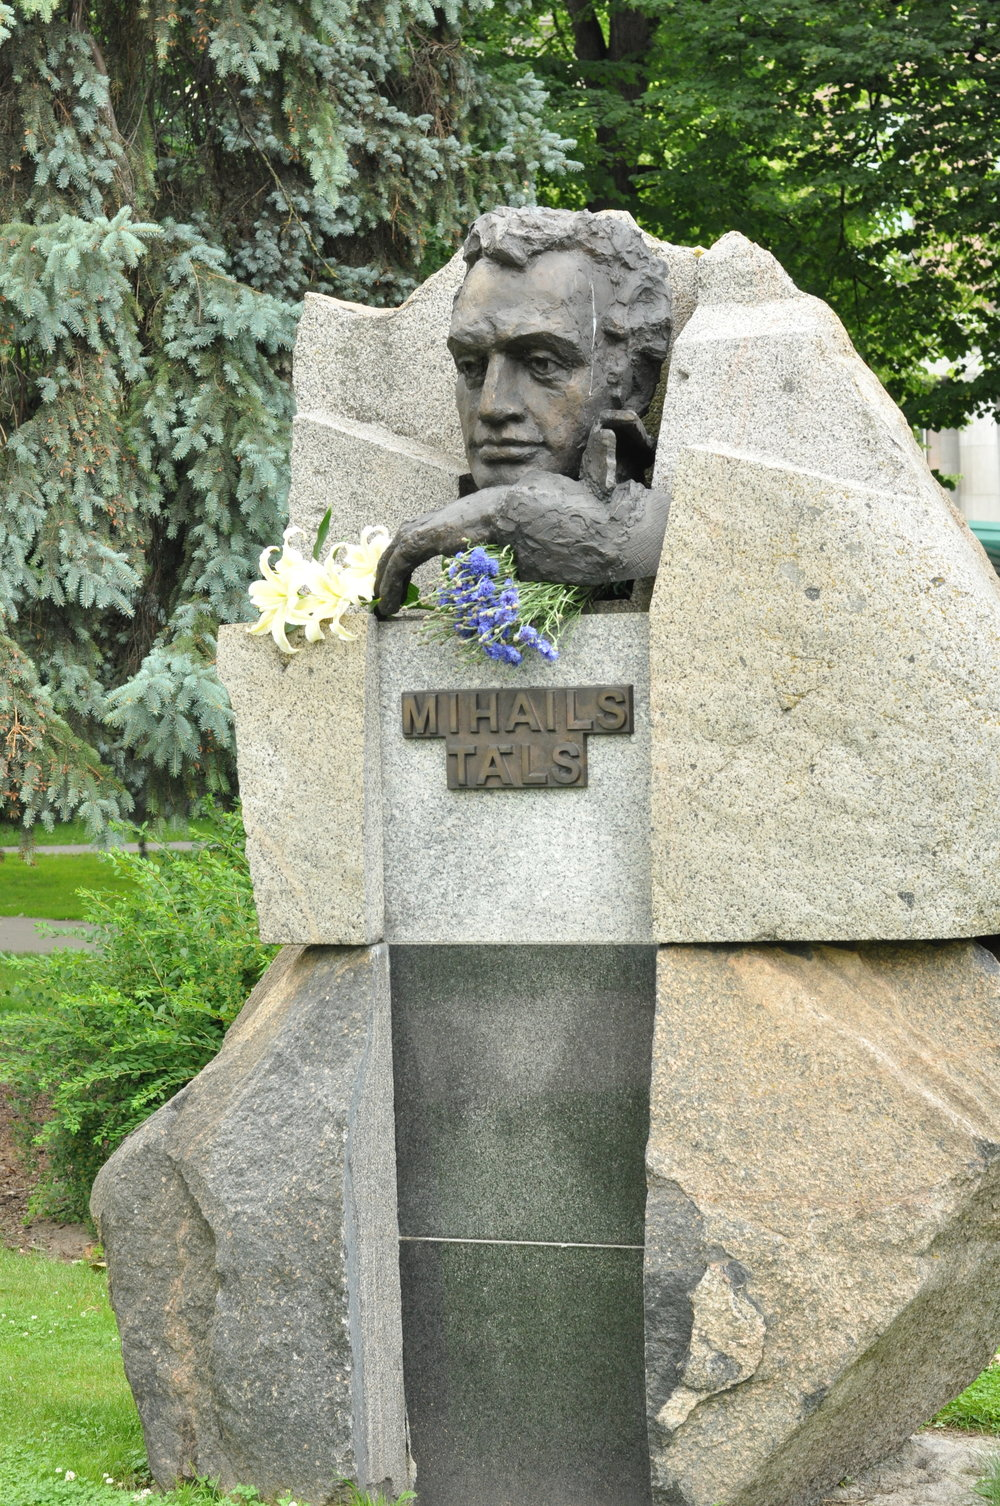 Mihails Tals Statue in Riga, Latvia